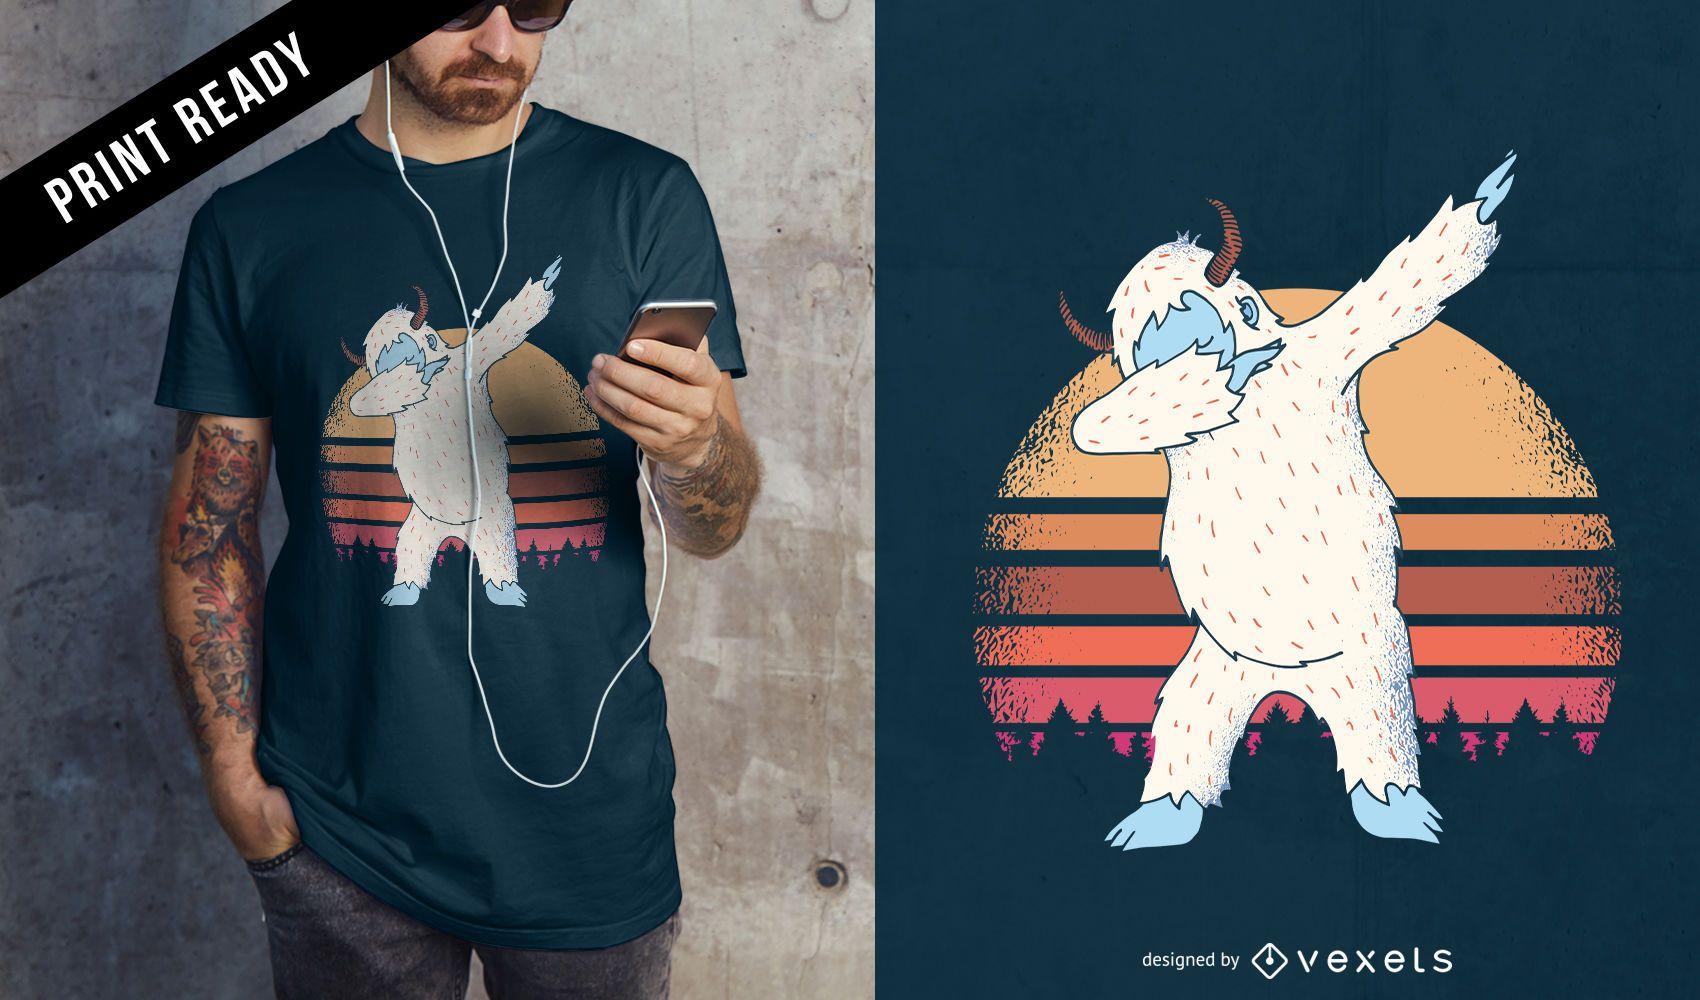 Dabbing Yeti Sunset Funny Meme T-shirt Design